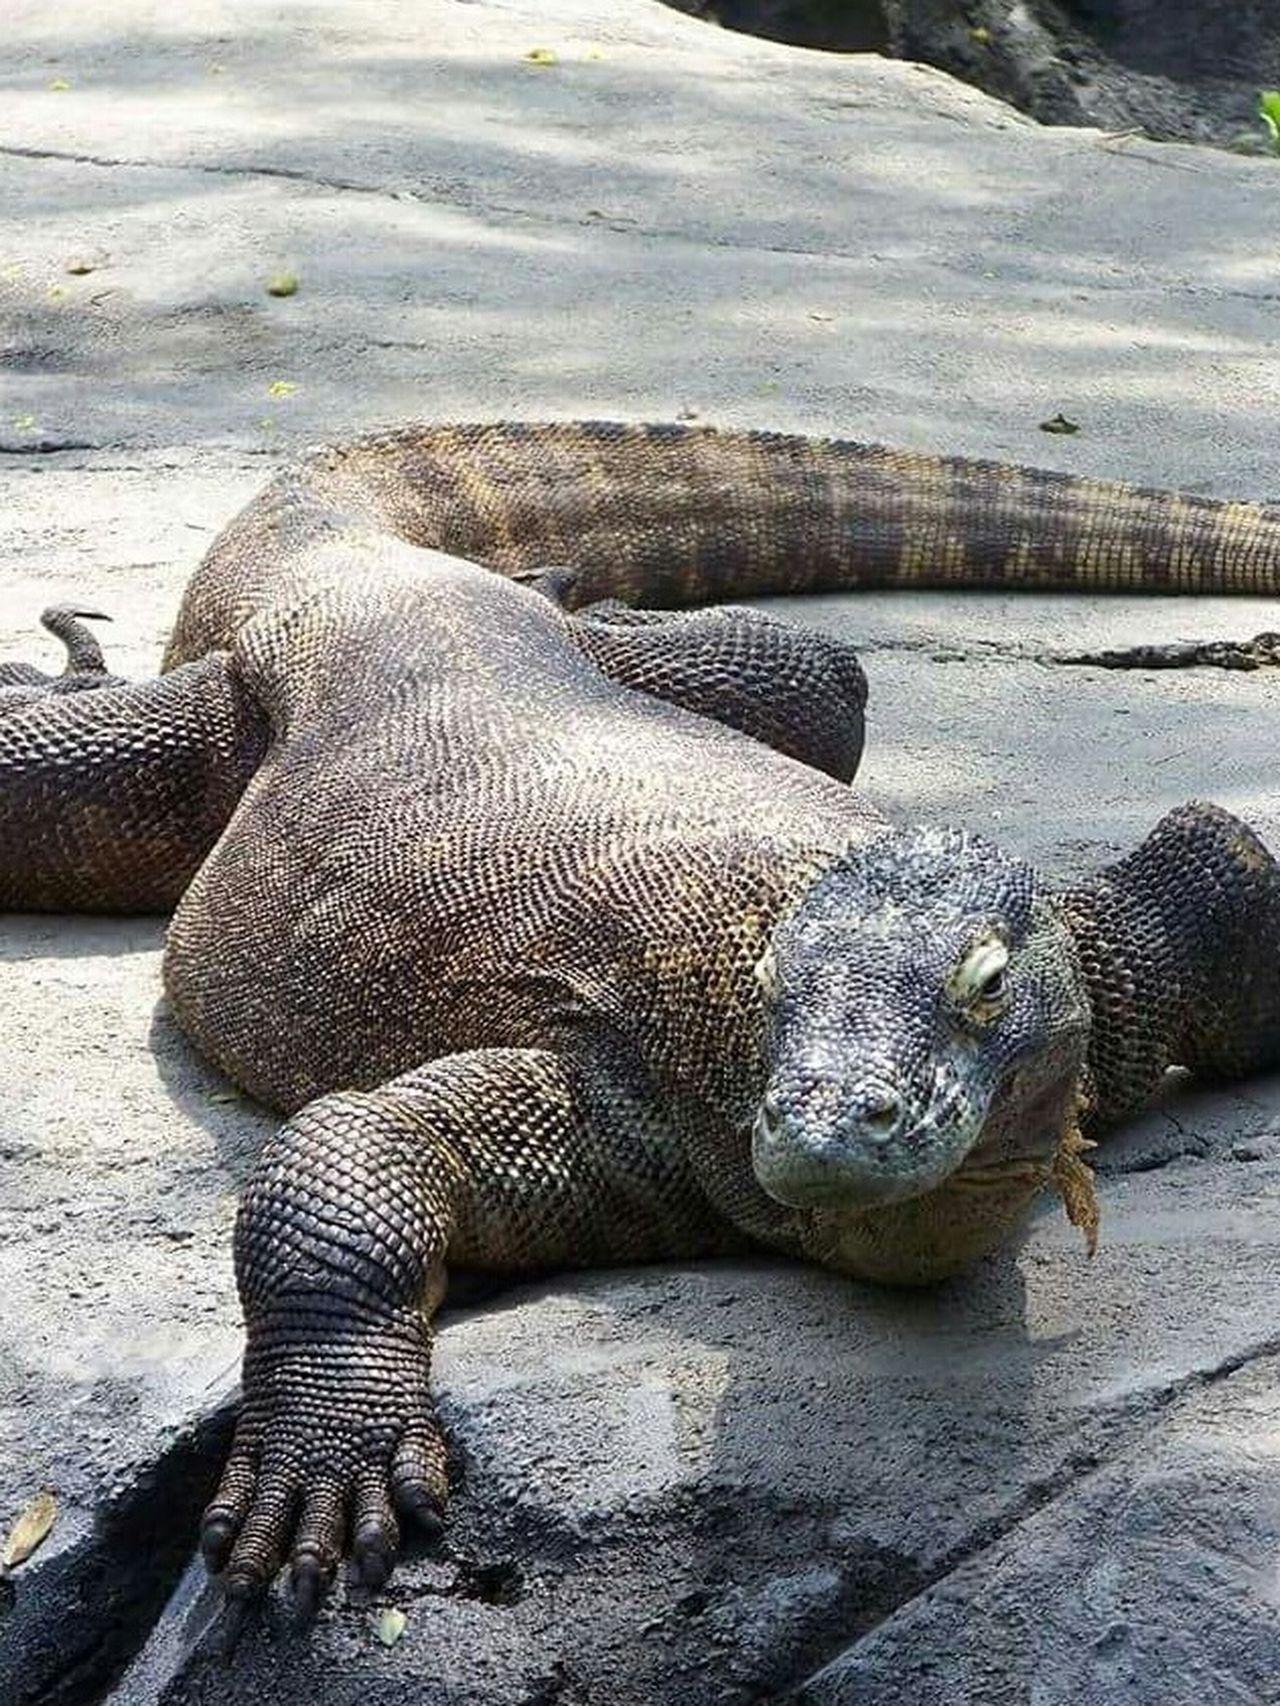 Komodo Dragon Columbuszoo Cheese! Ohio Lizardlove Eyeem Lizards SaveKomodo Lizardporn Lizard Love